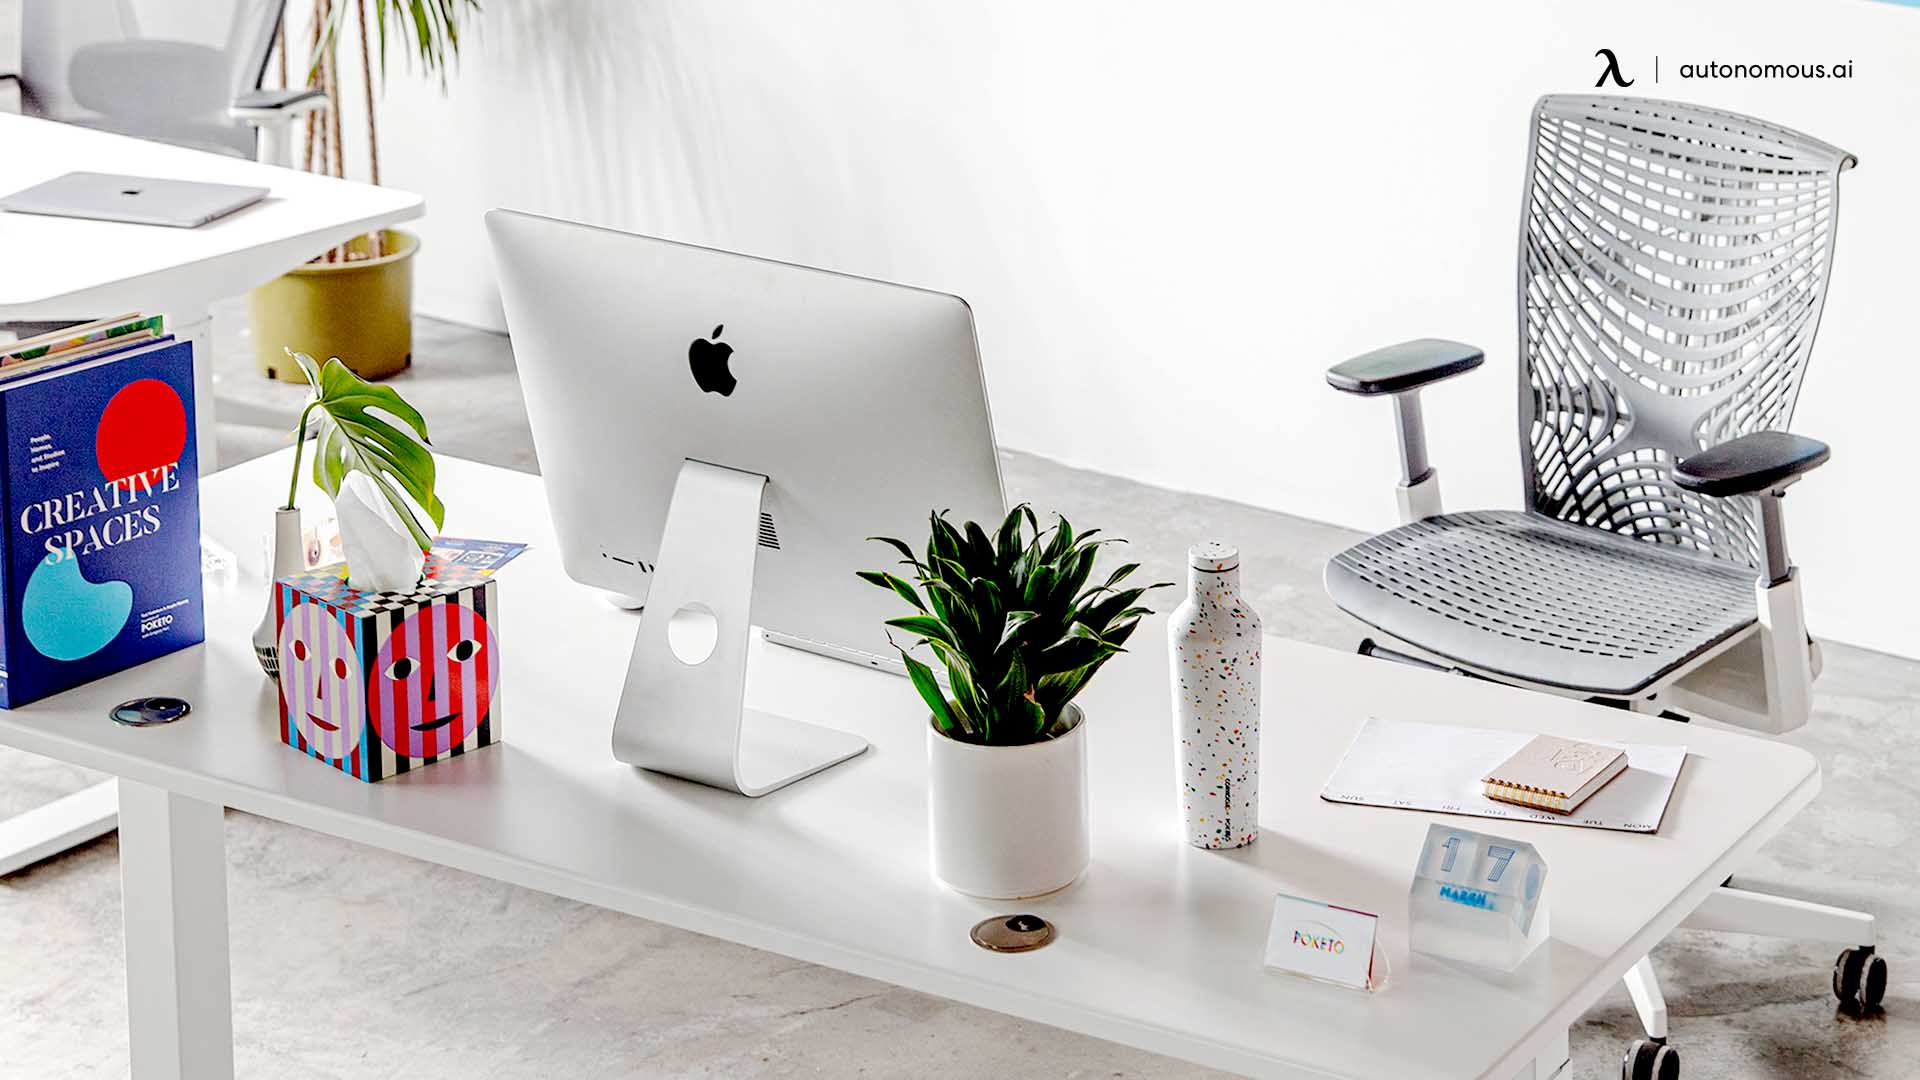 Creativity for modern home office